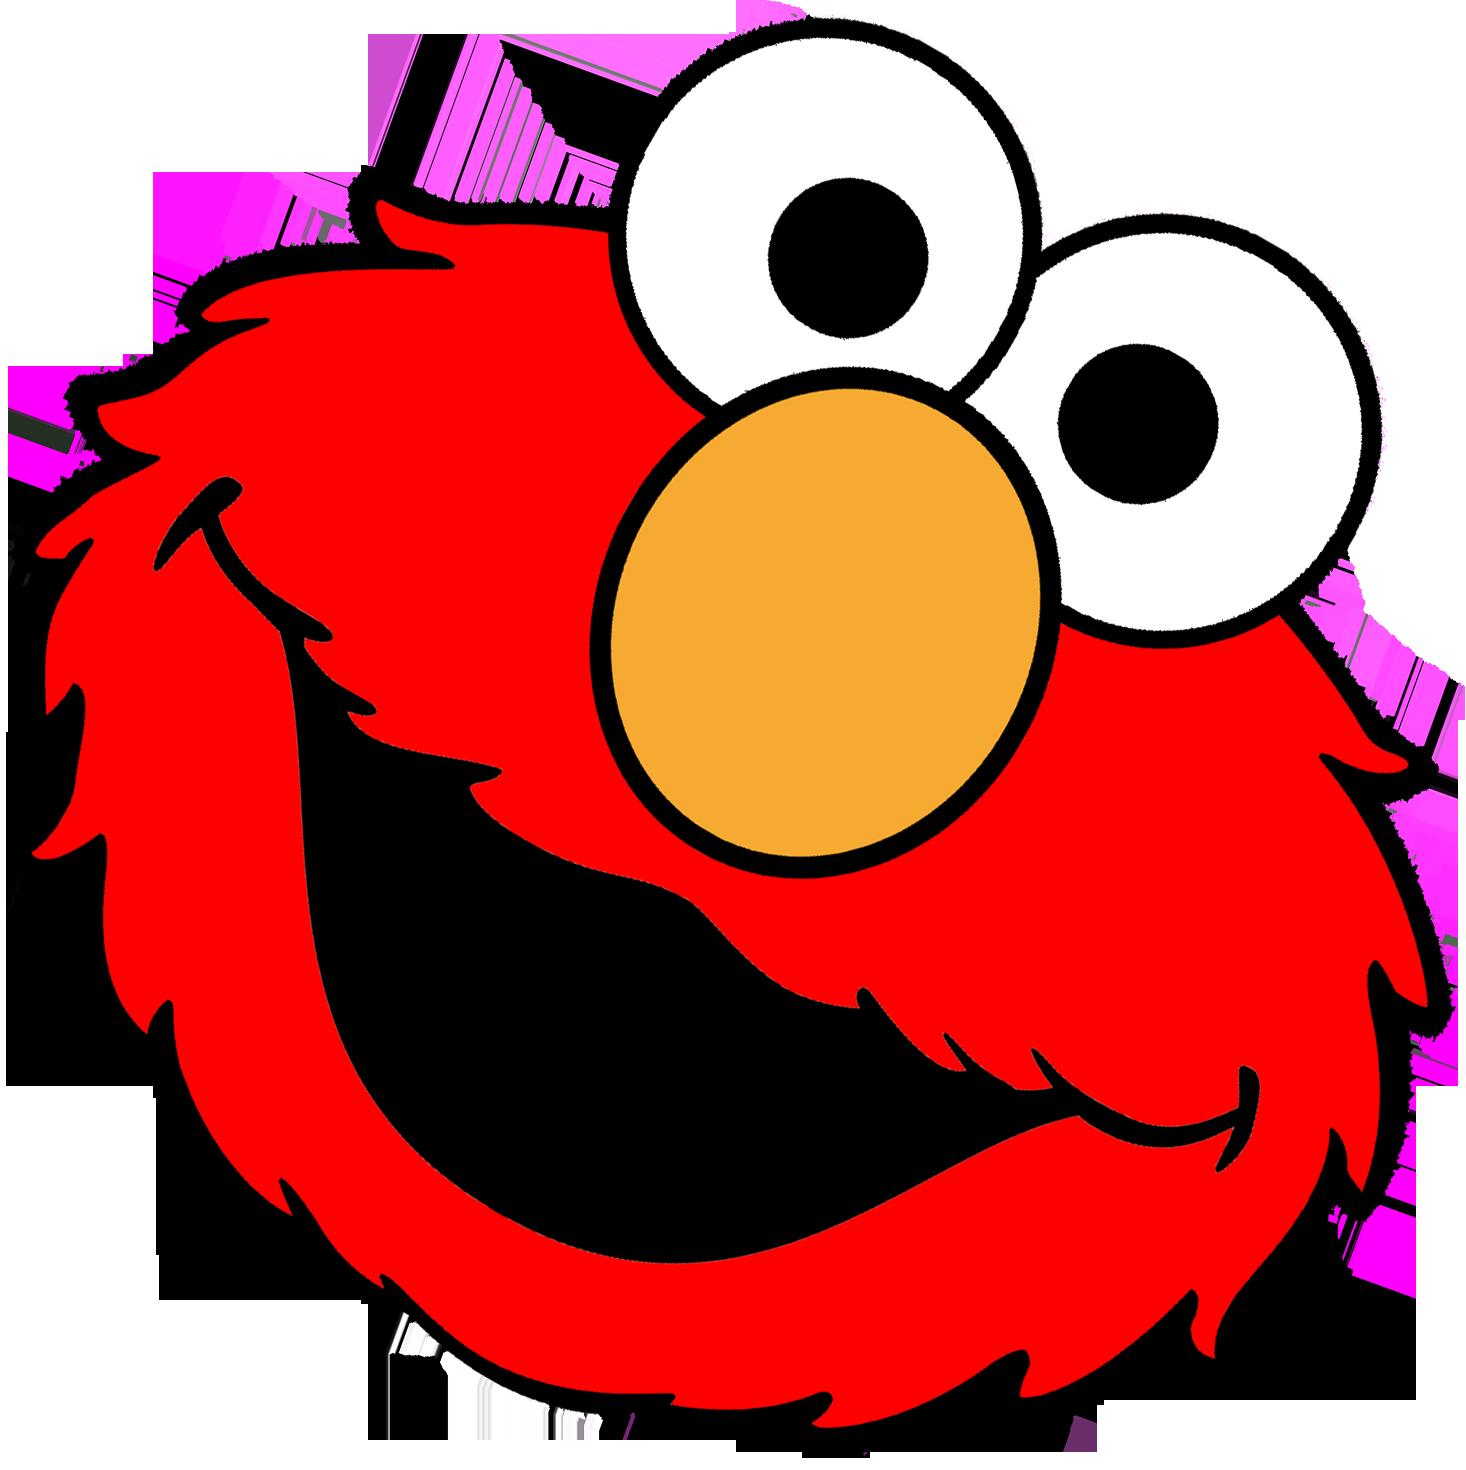 Https Shwetamenon4 Files Wordpress Com 2015 04 Elmo Sabe Donde Vives Png Toddler Party Games Elmo Party Sesame Street Birthday